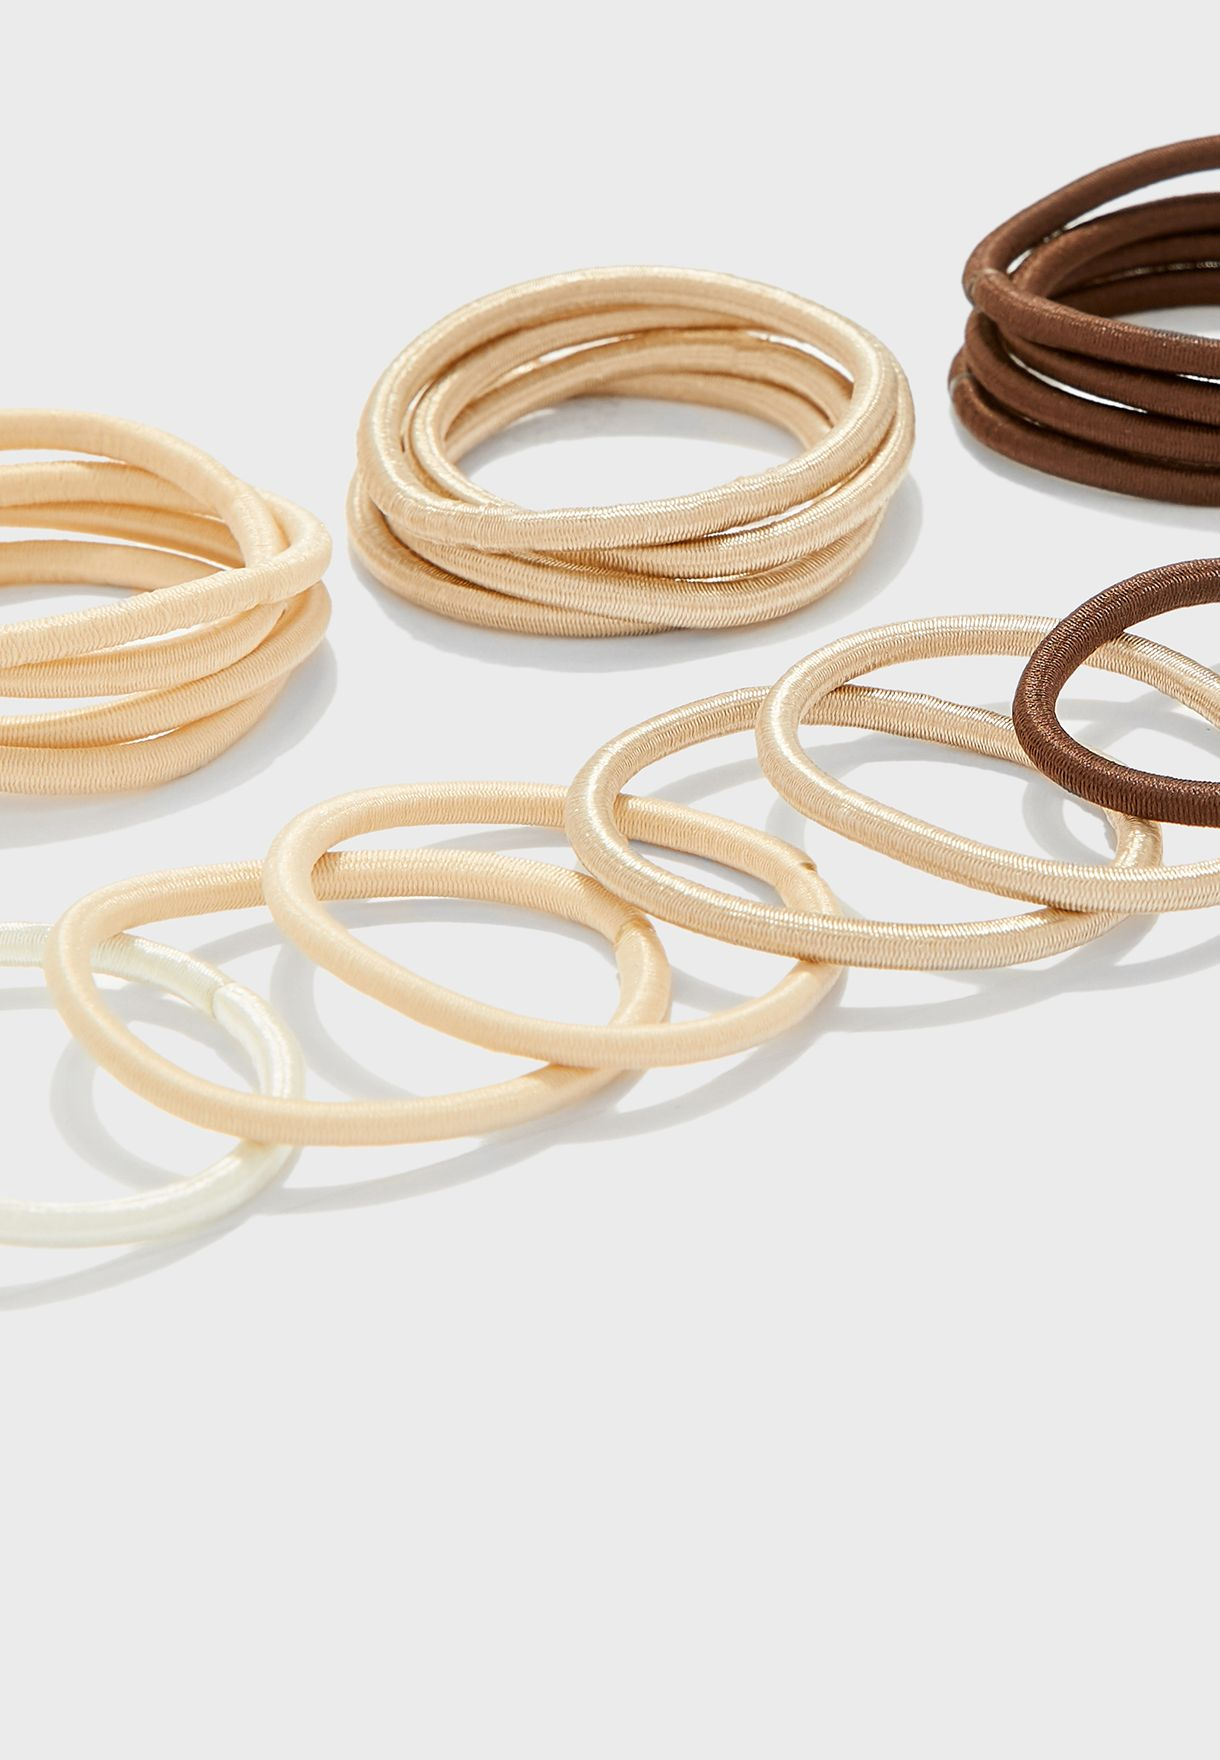 Elastic hair ties for ponytails